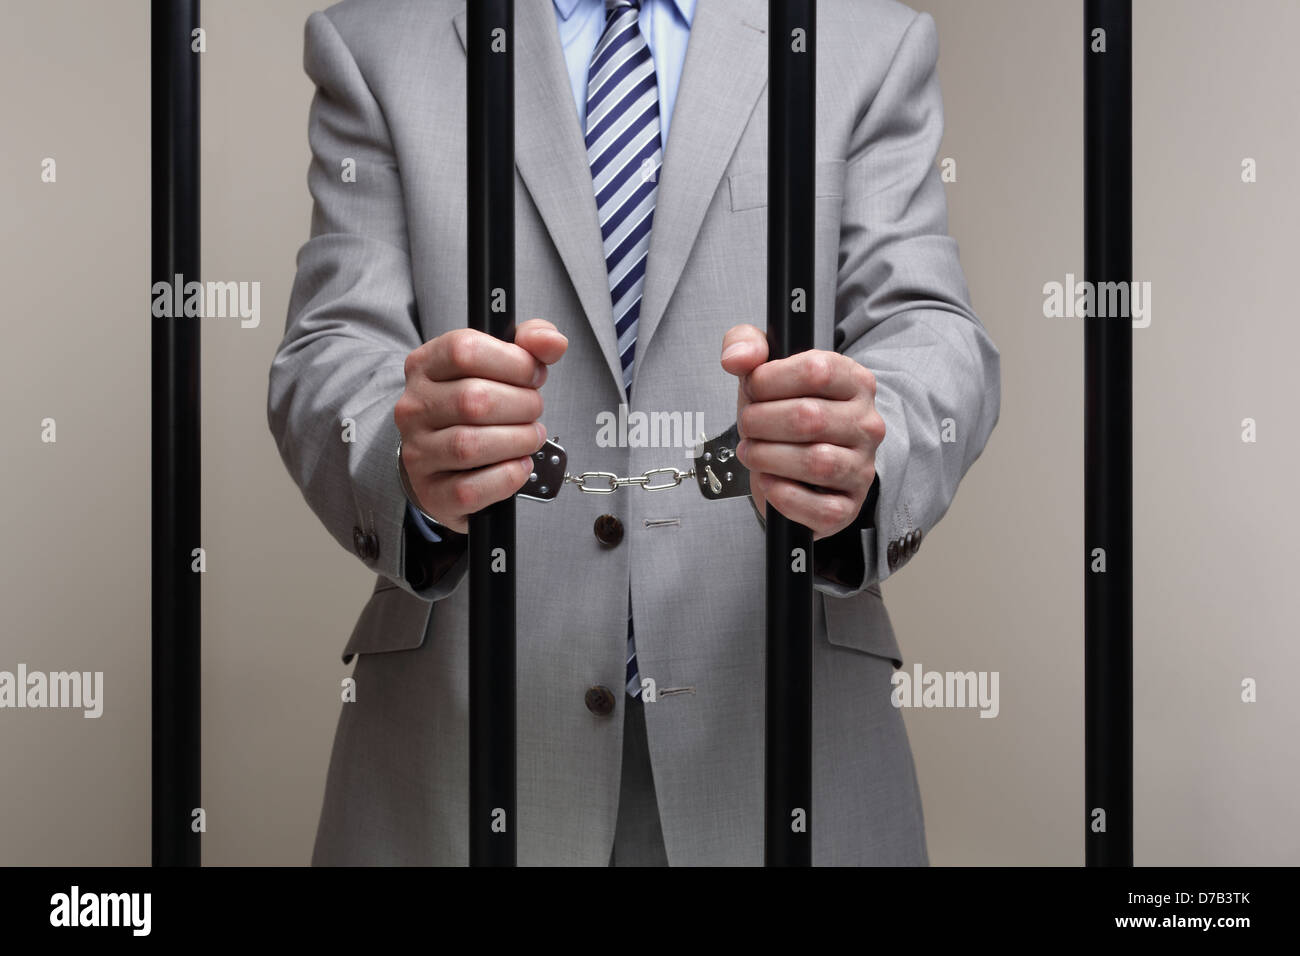 Wirtschaftsstrafrecht Stockbild